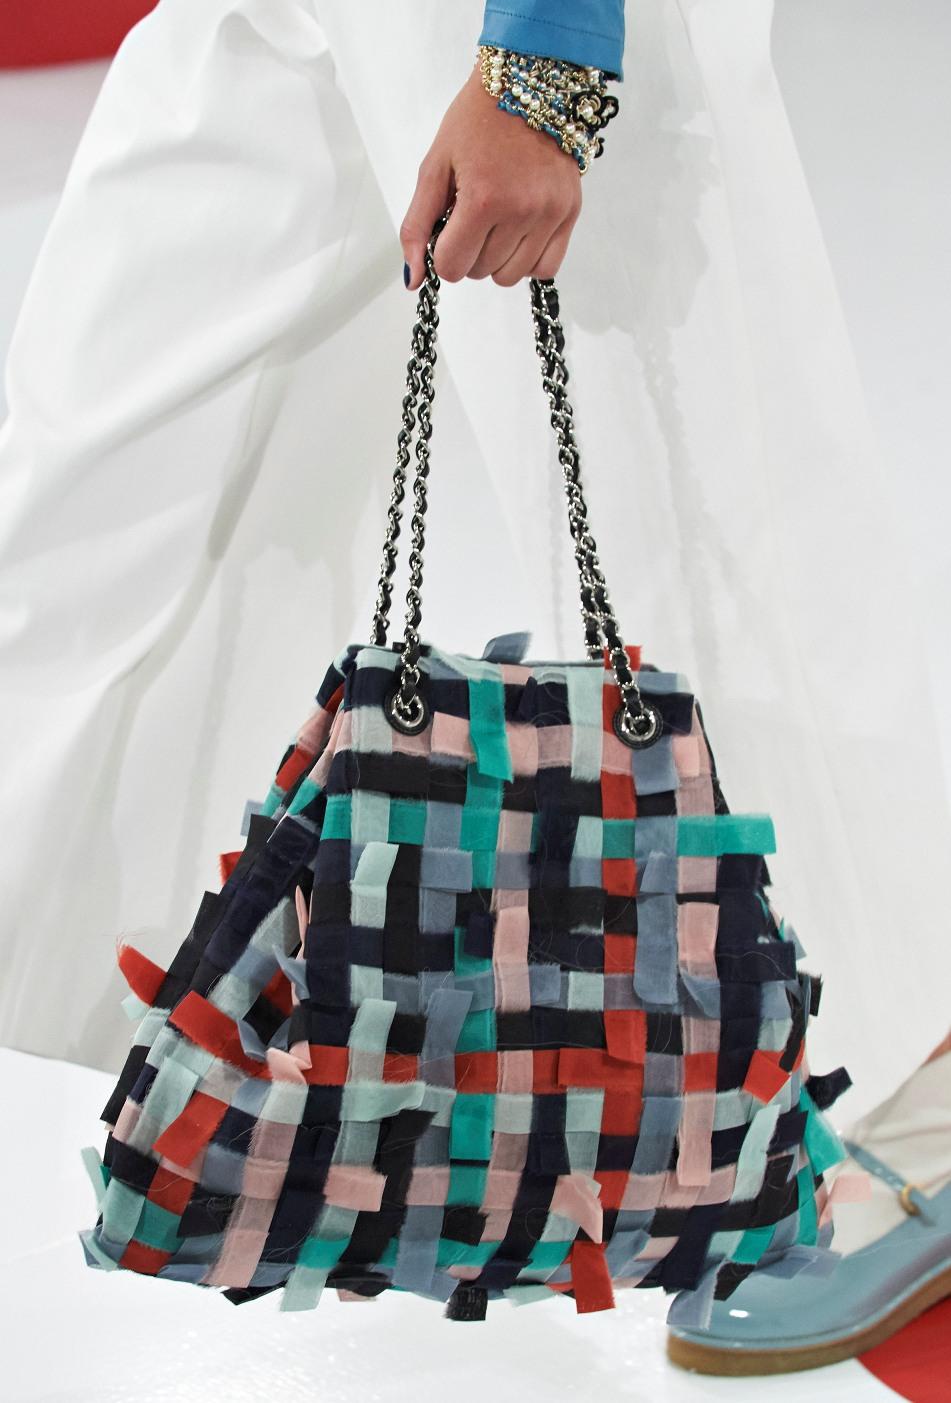 chanel-seoul-resort-cruise-2016-bags-accessories-11  08e447b465d6e